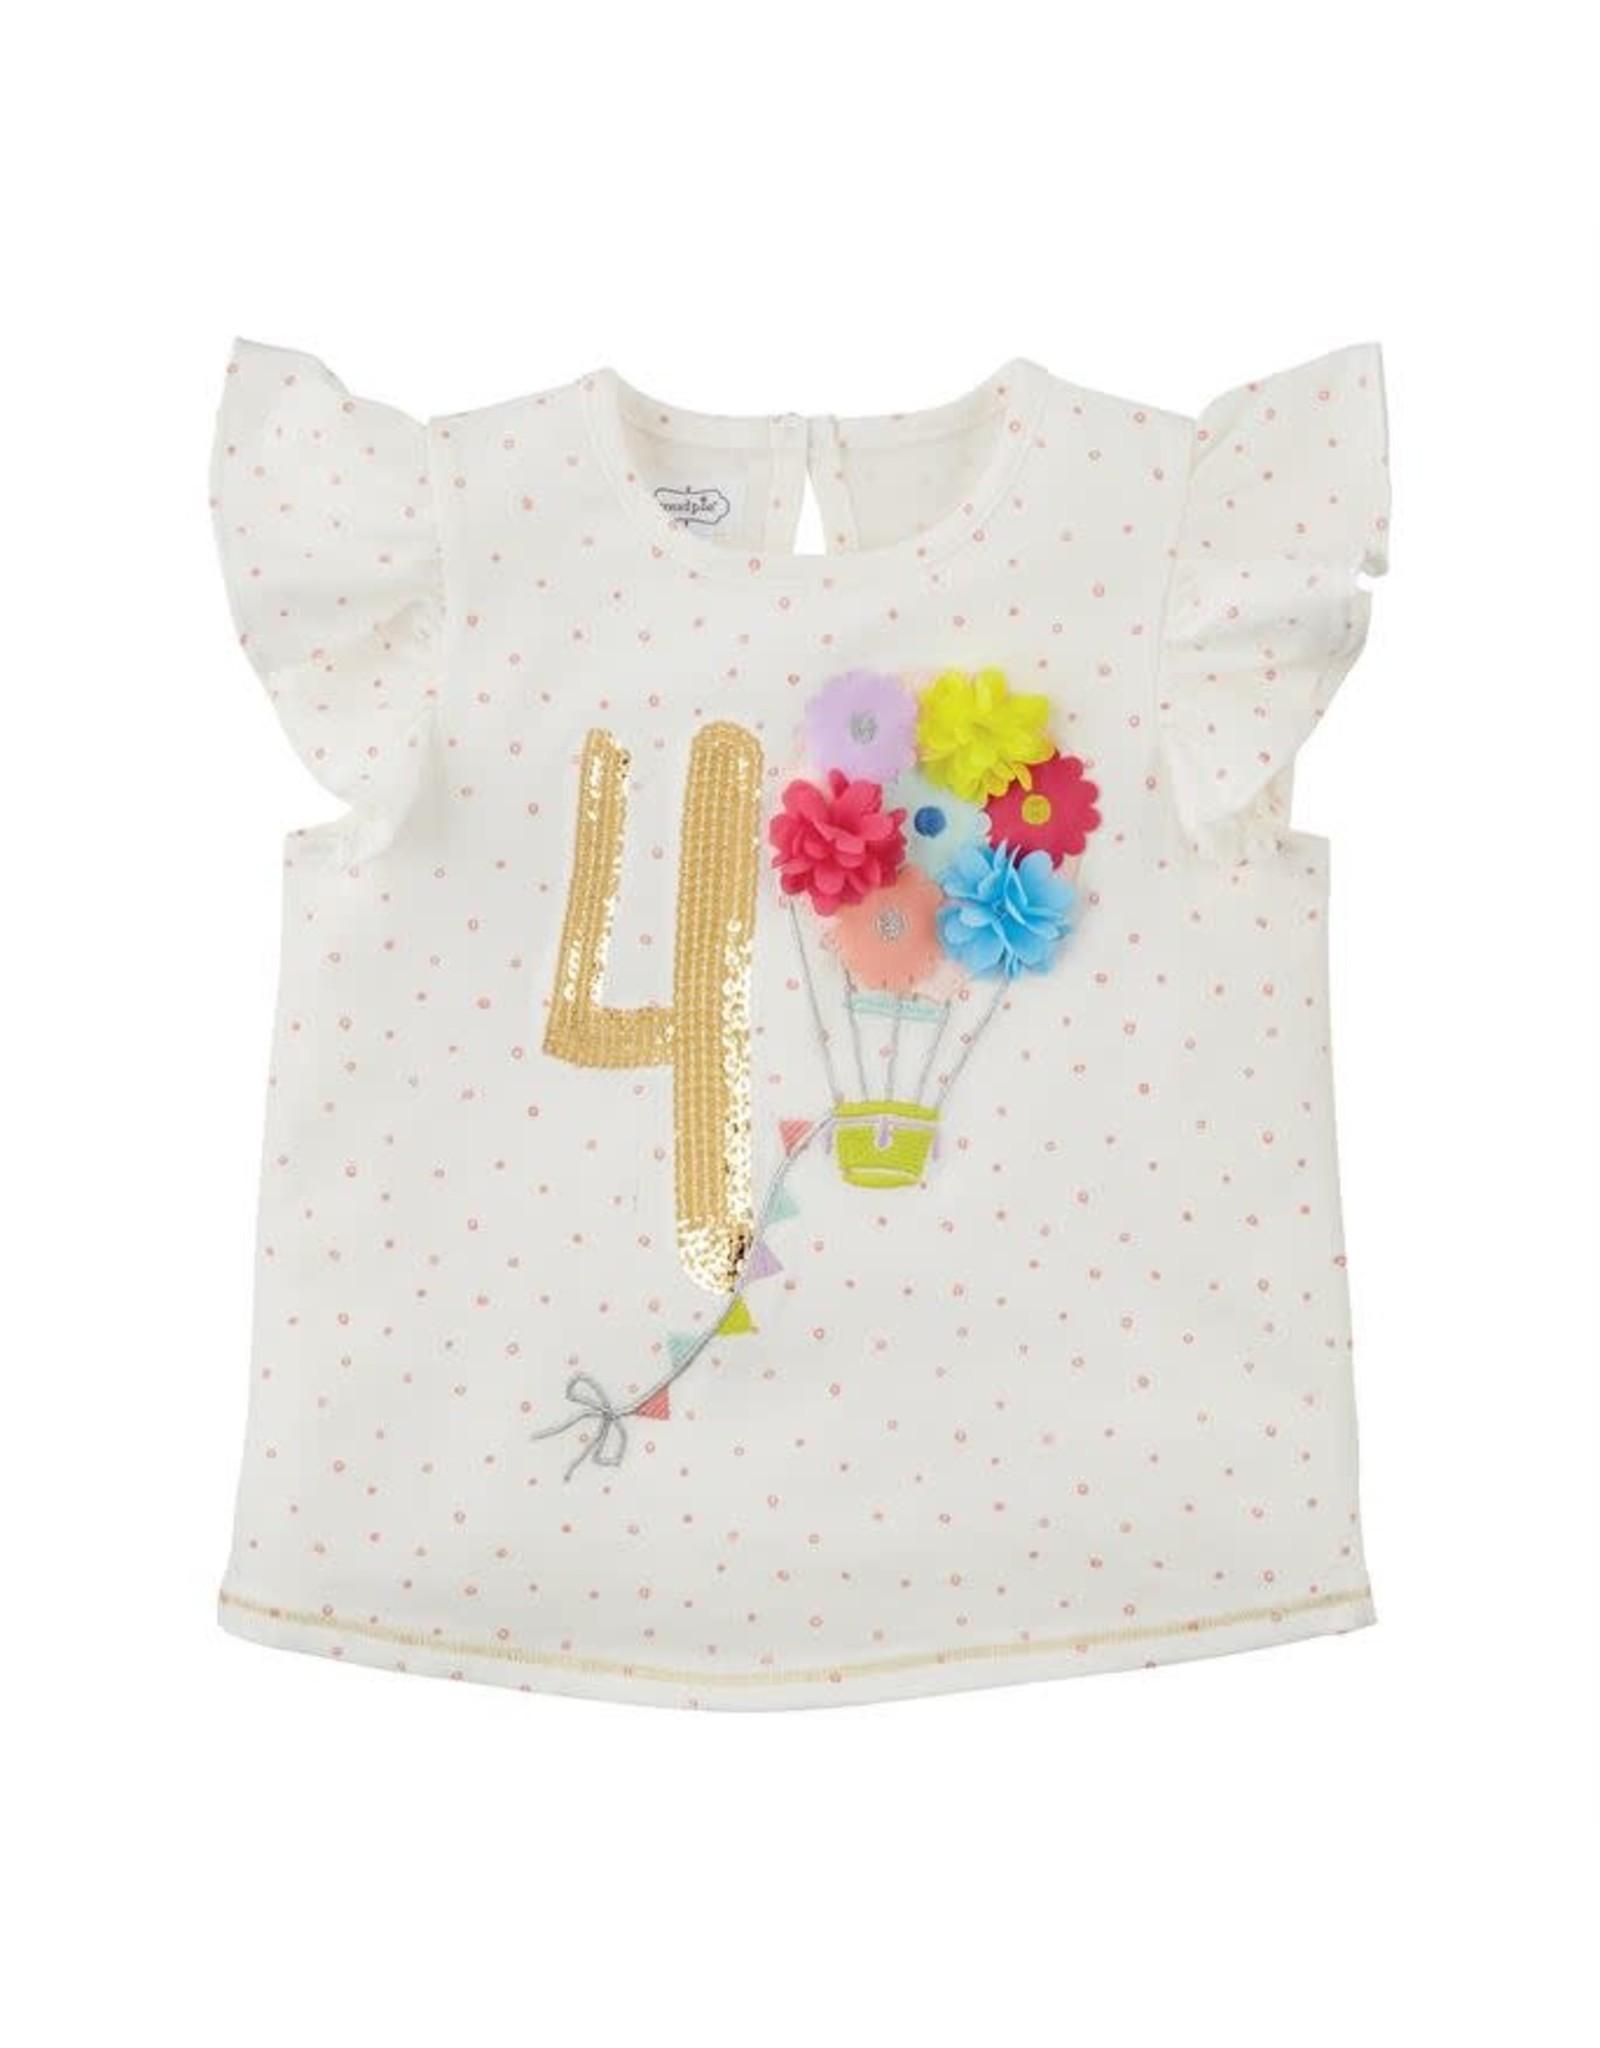 Mudpie Mud Pie- Four Birthday Shirt 4T